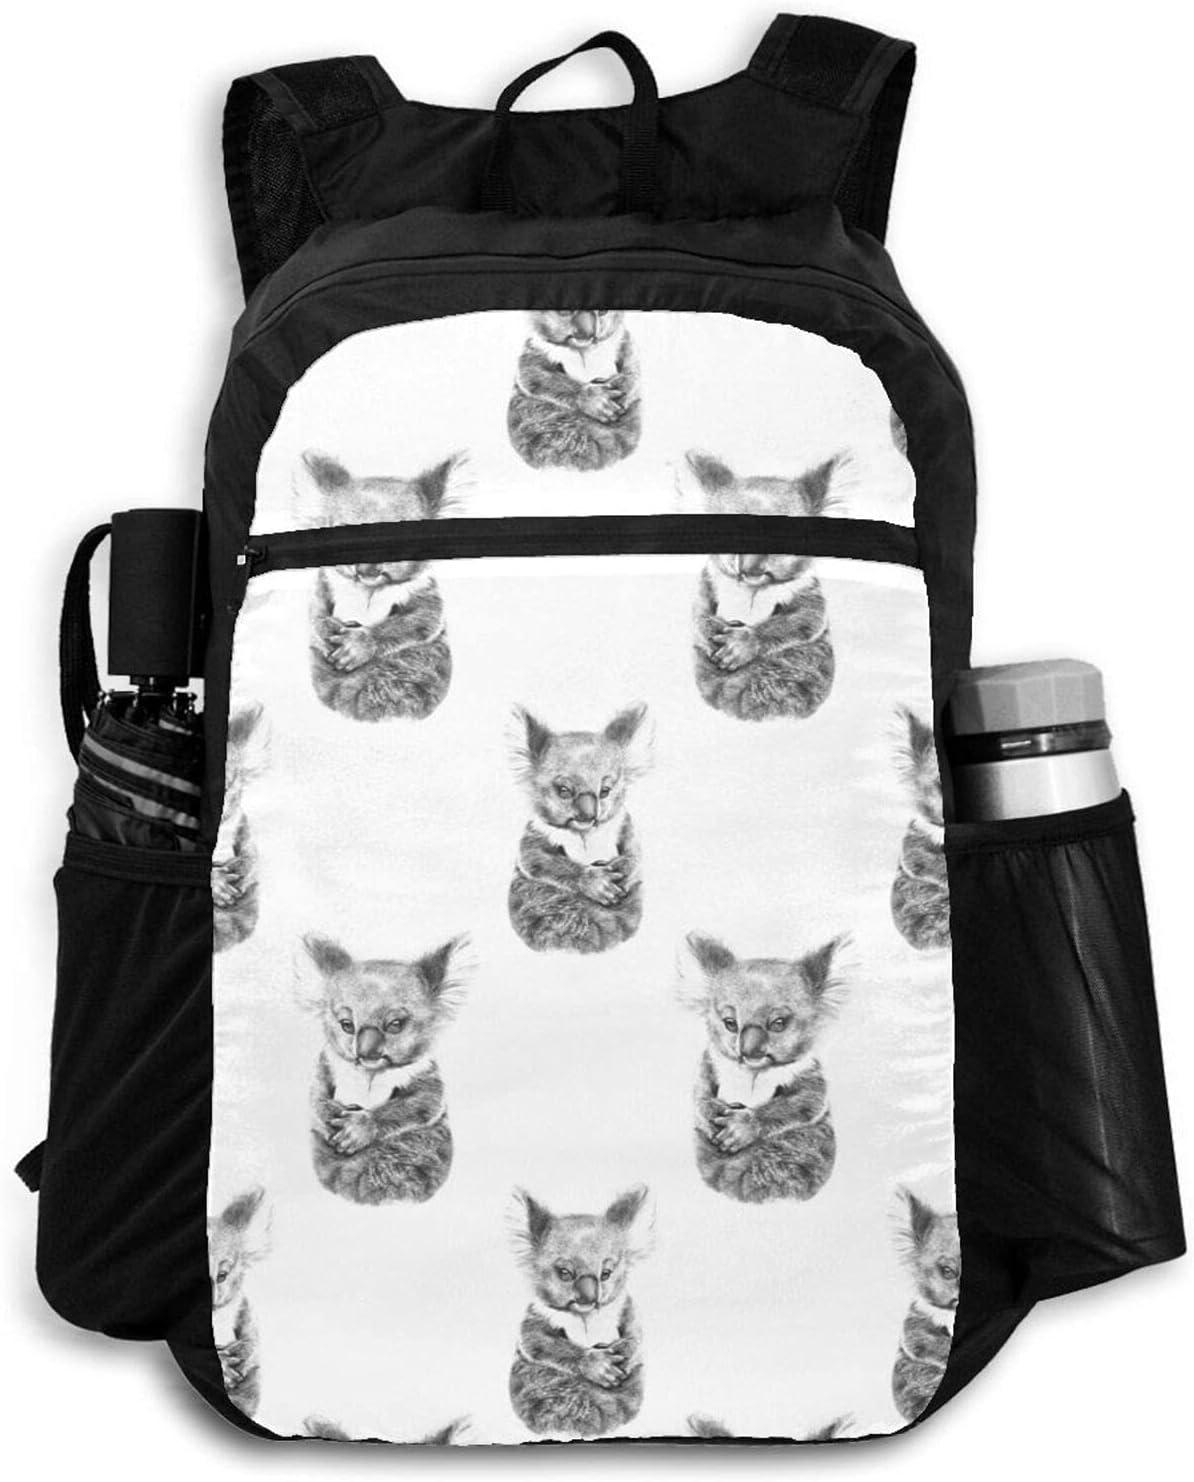 Zolama Baby Koala Backpacks for Price reduction Packable Women Cute Daypack Men Dealing full price reduction